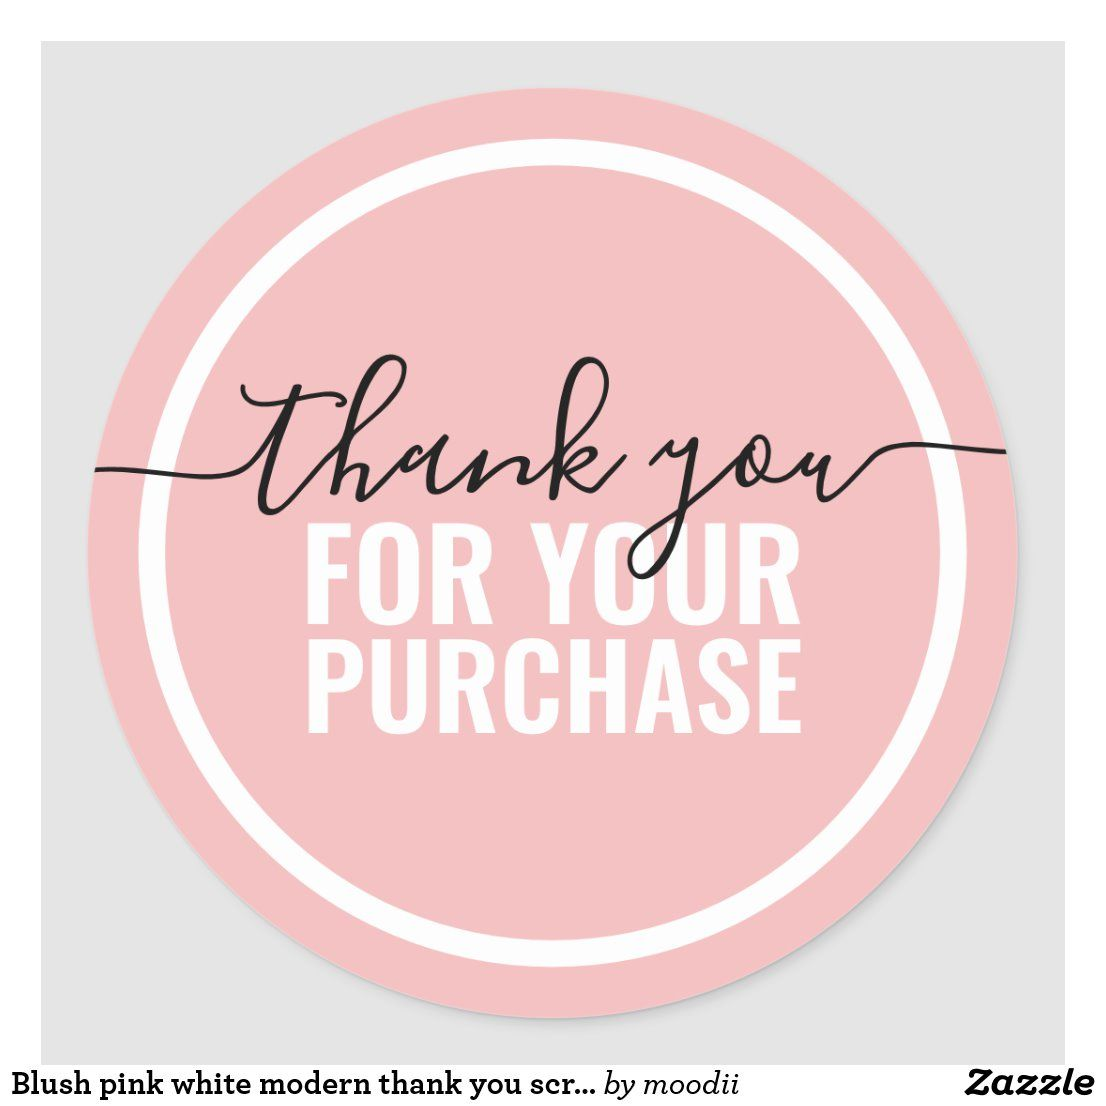 Blush pink white modern thank you script packaging classic